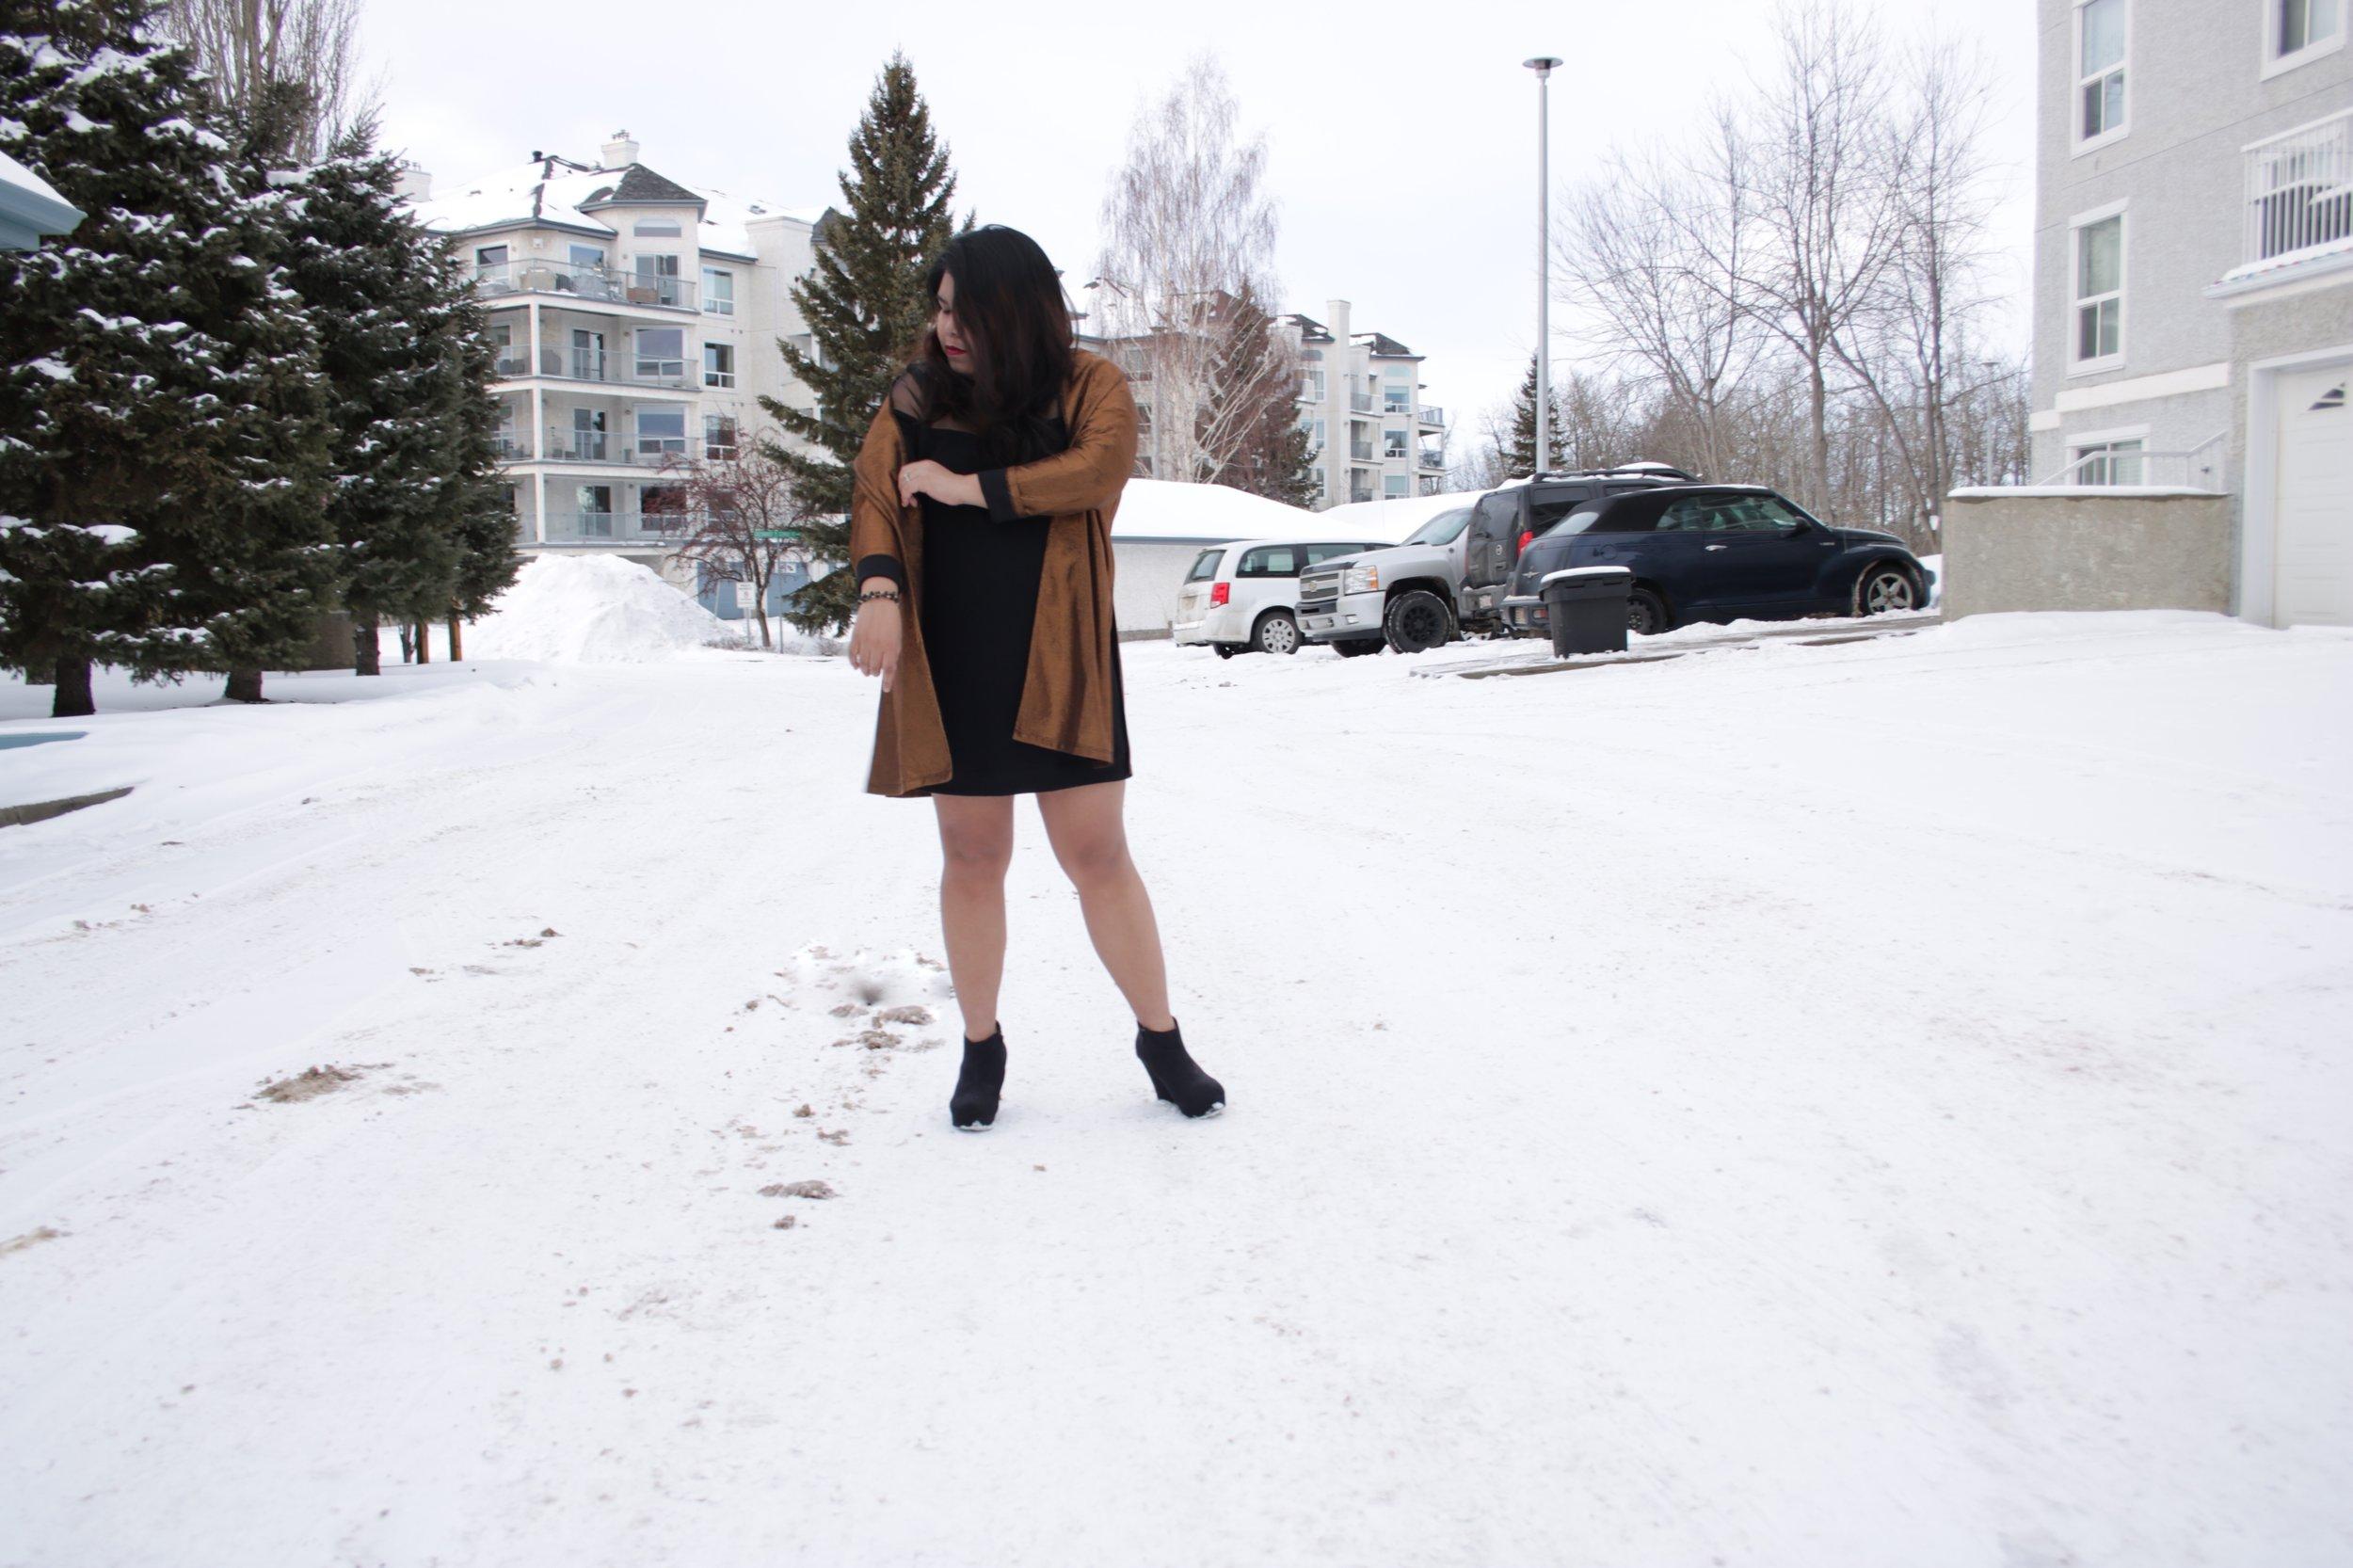 metallic fashion trend, metallic fashion, fashion trend 2018, fashion trend 2019, how to wear metallic, how to style metallic, metallic coat, wear metallic fashion, winter outfit idea, night outfit idea, how to wear sparkles